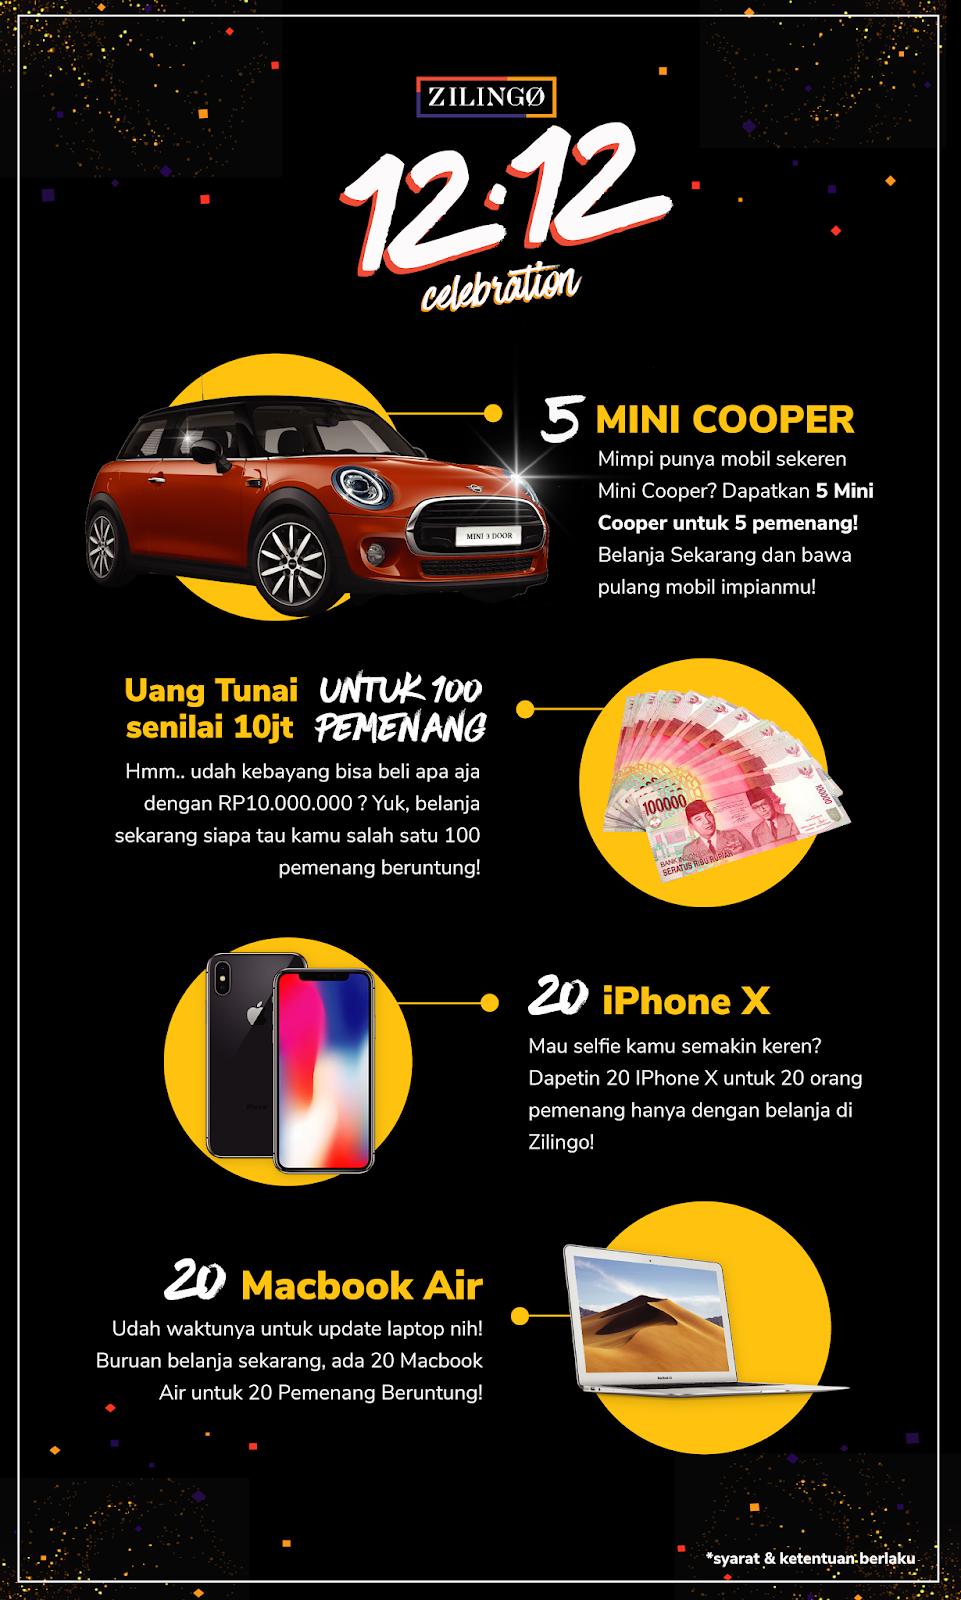 Zilingo - Promo 12.12 Celebration Dapatkan Mini Cooper & Hadiah Lainnya